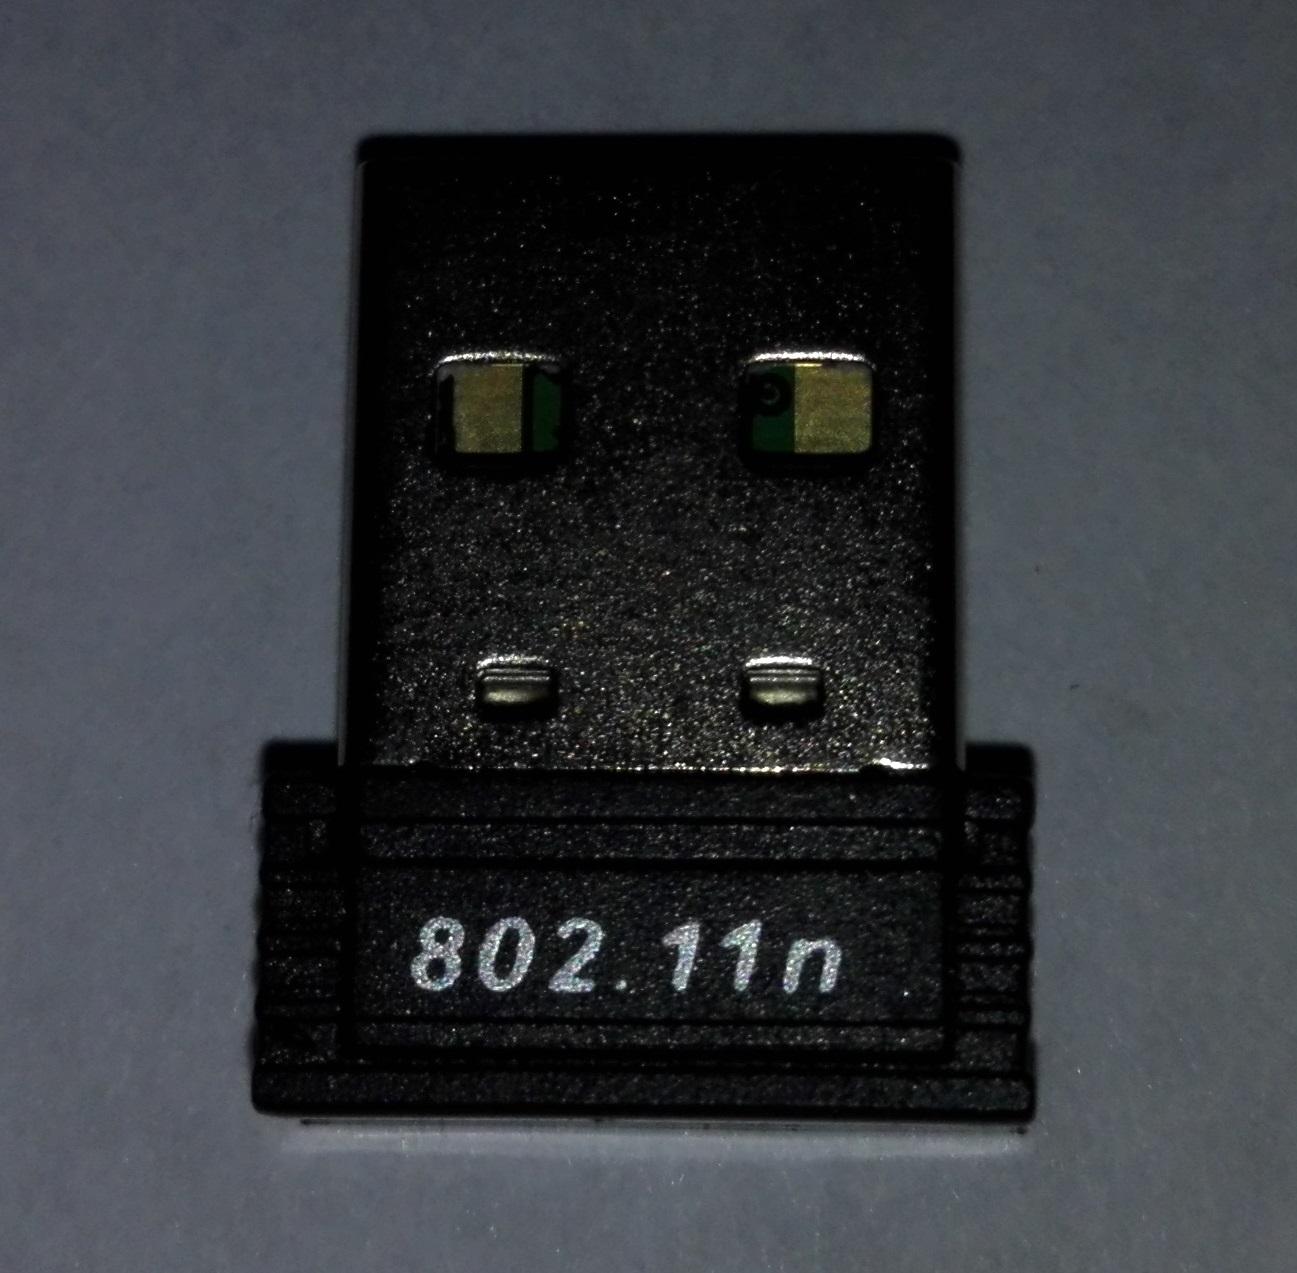 Controladores Mini-Wifi 802.11n - 2.0